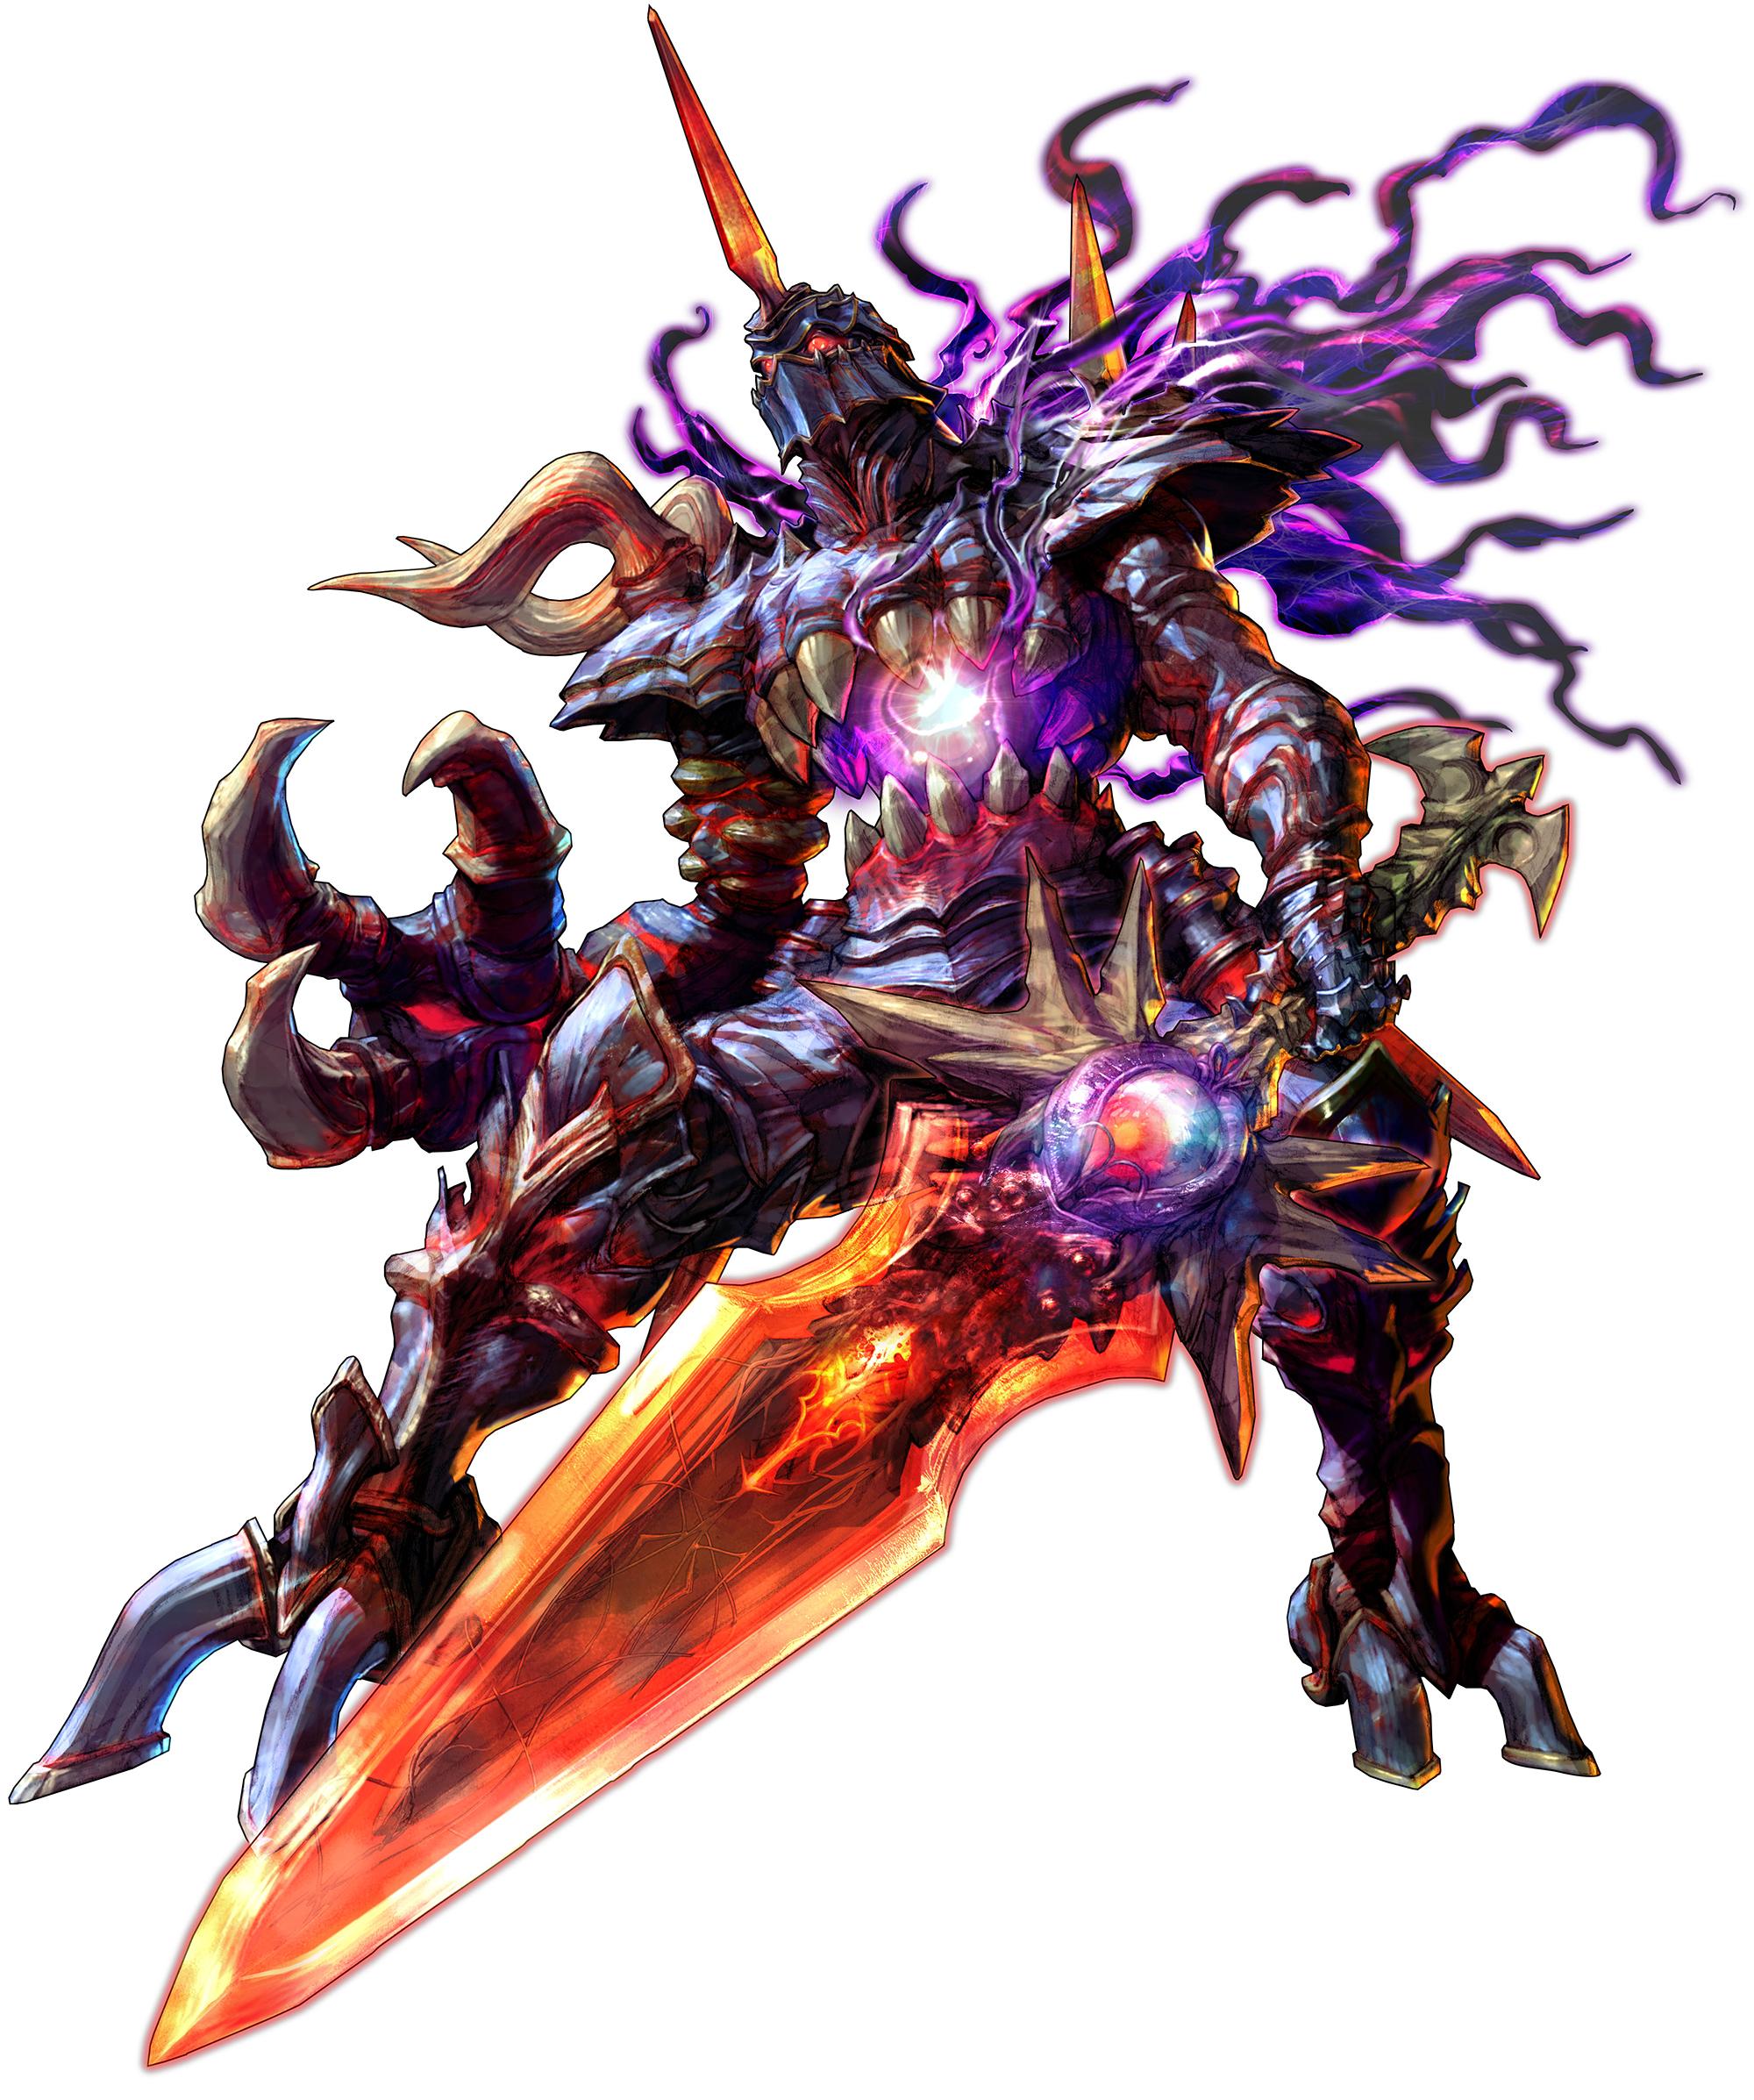 Nightmare/Inferno   Soulcalibur Wiki   Fandom powered by Wikia  Nightmare/Infer...